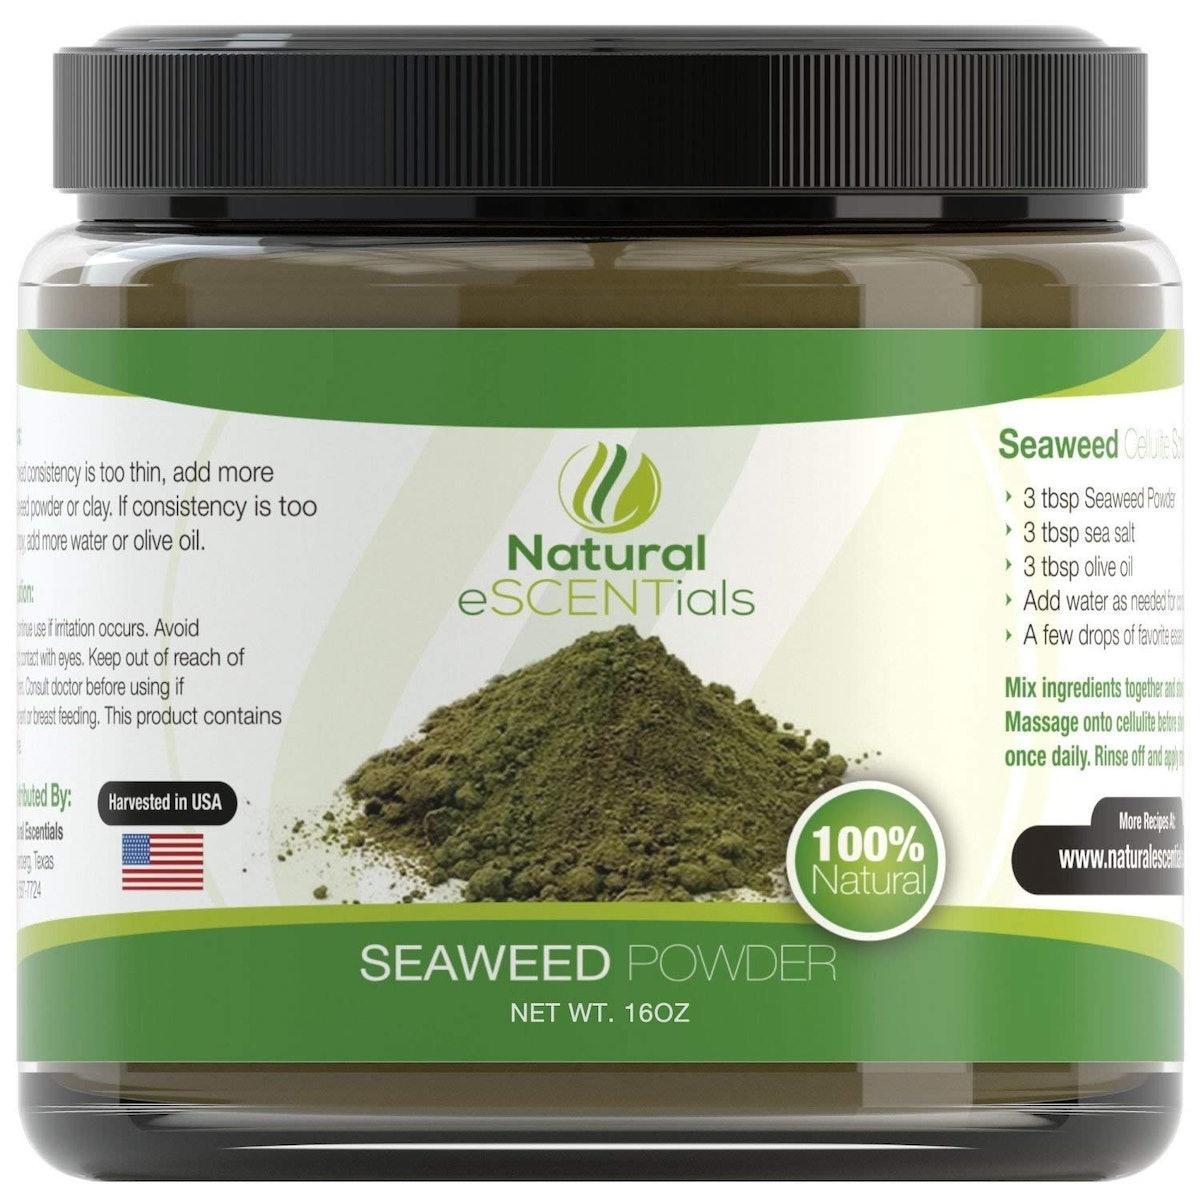 Natural Escentials Seaweed Powder